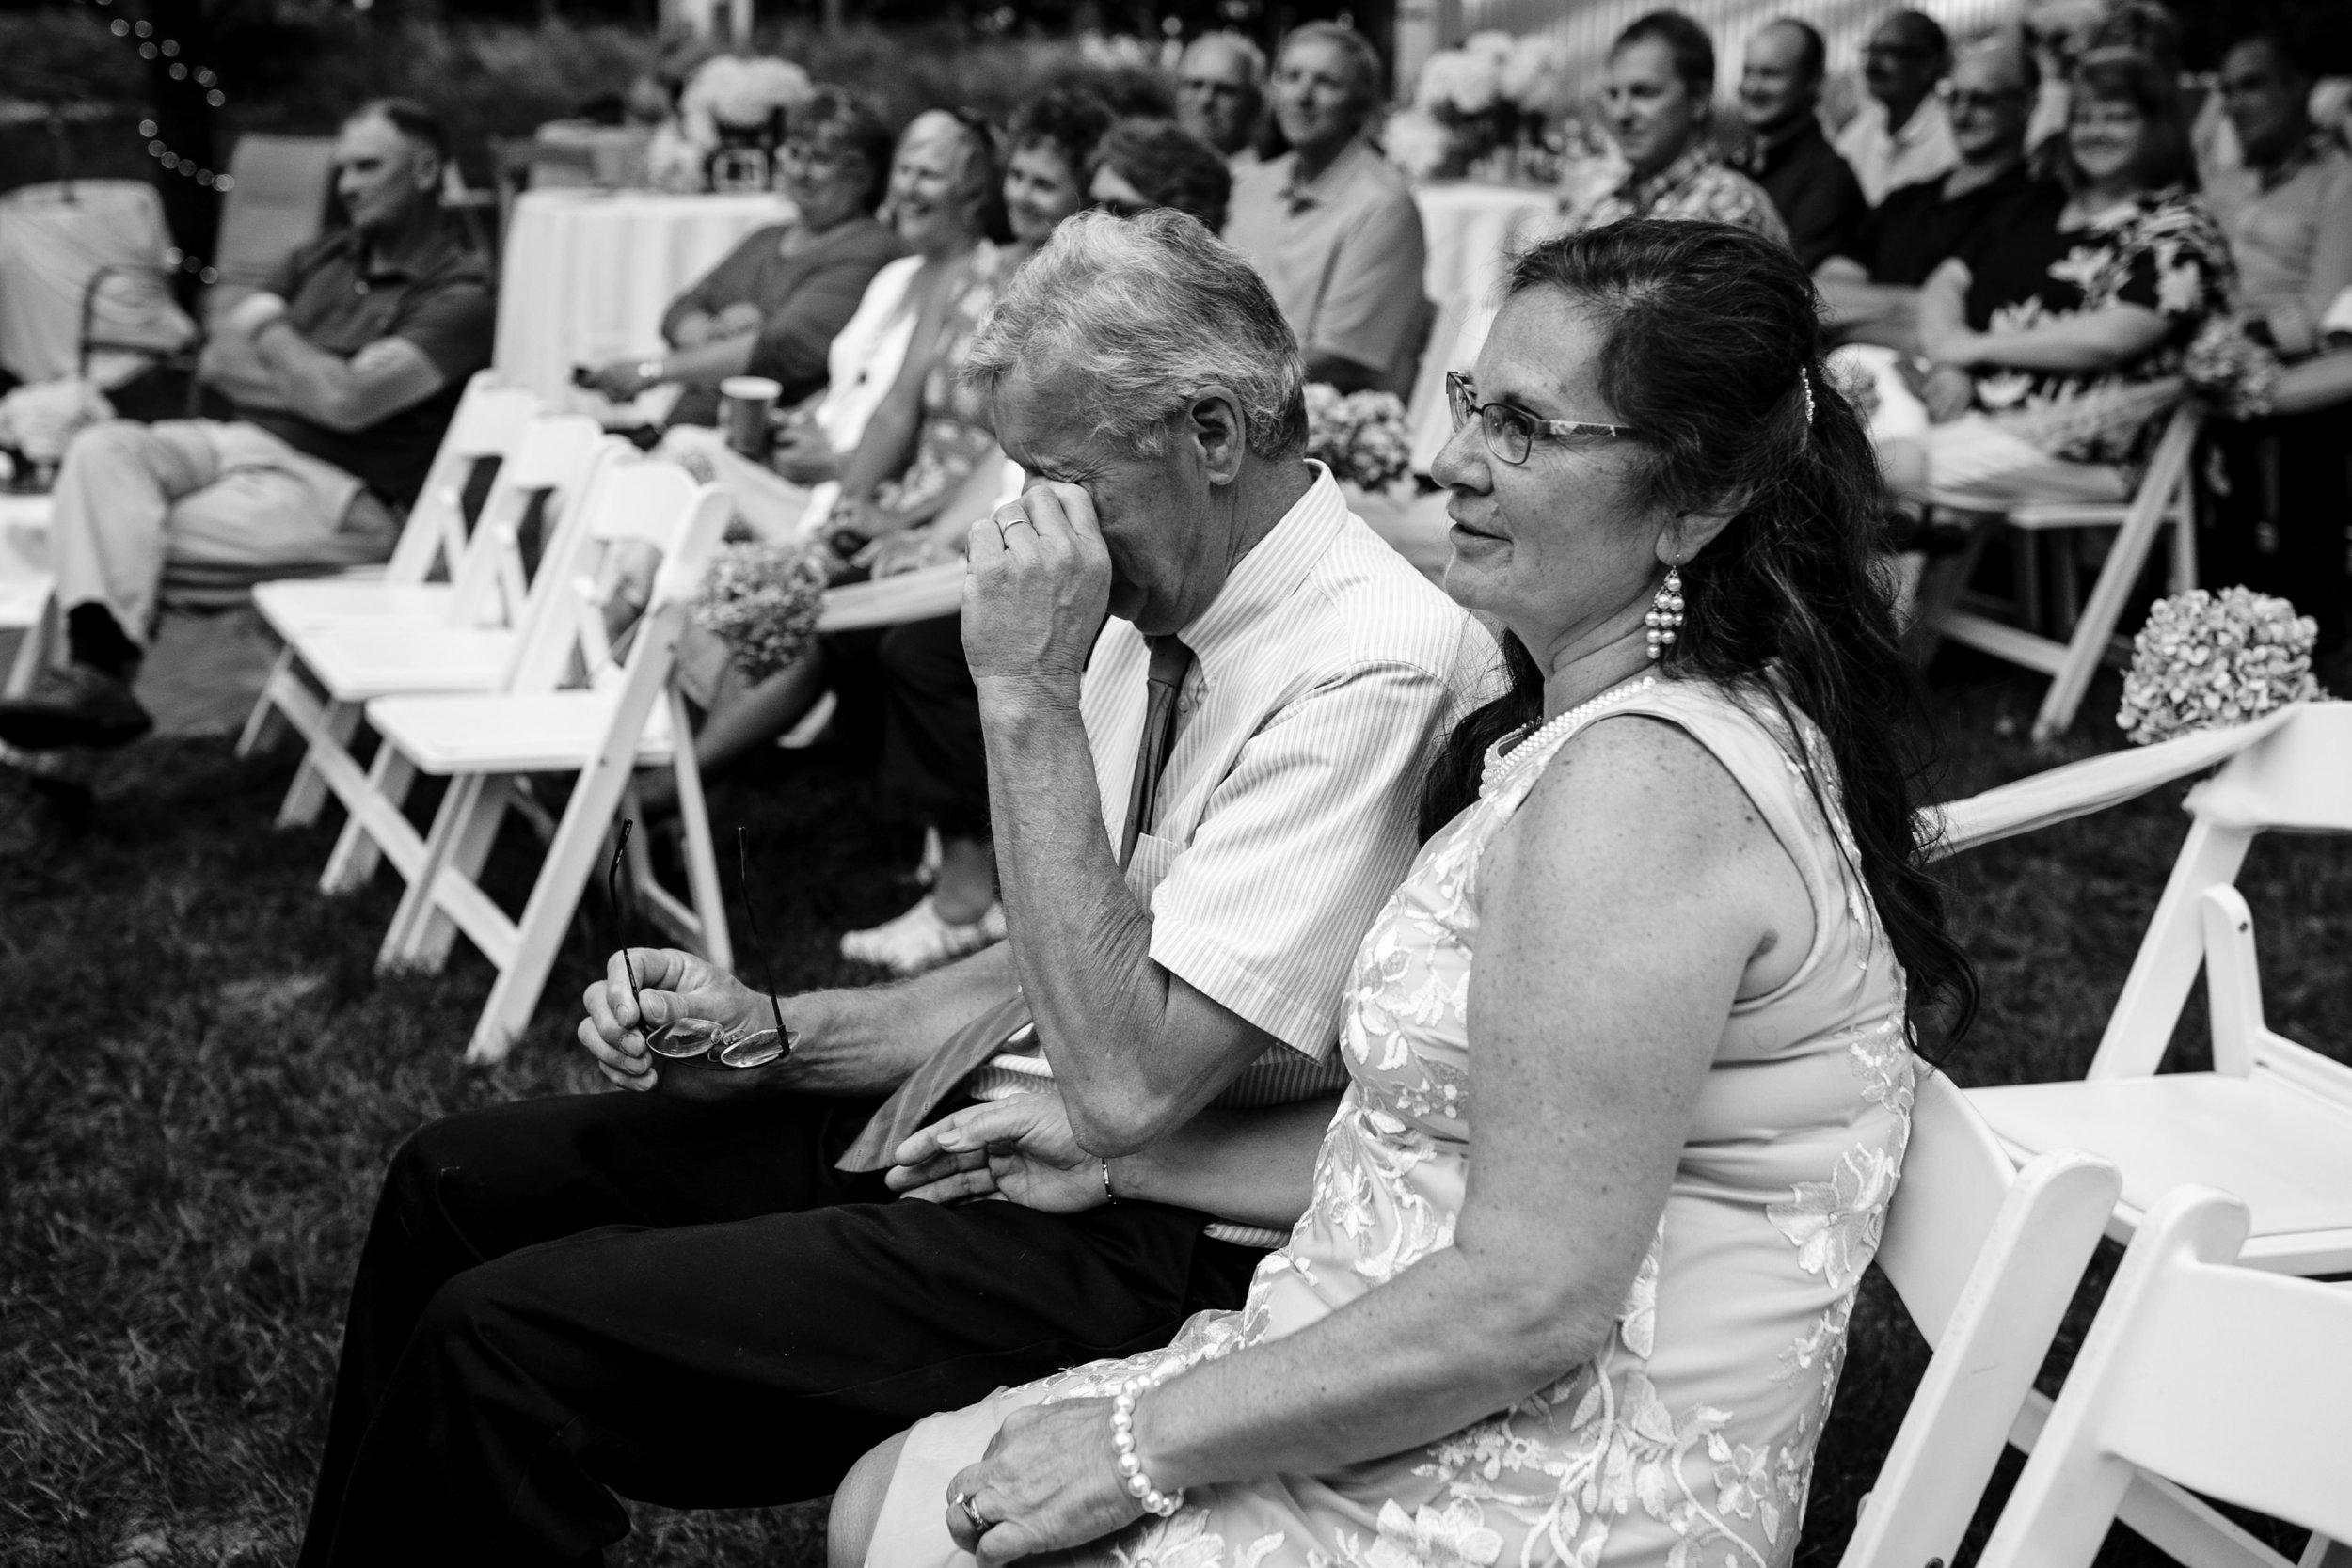 ludington-michigan-intimate-backyard-wedding-jessica-nolan276.jpg